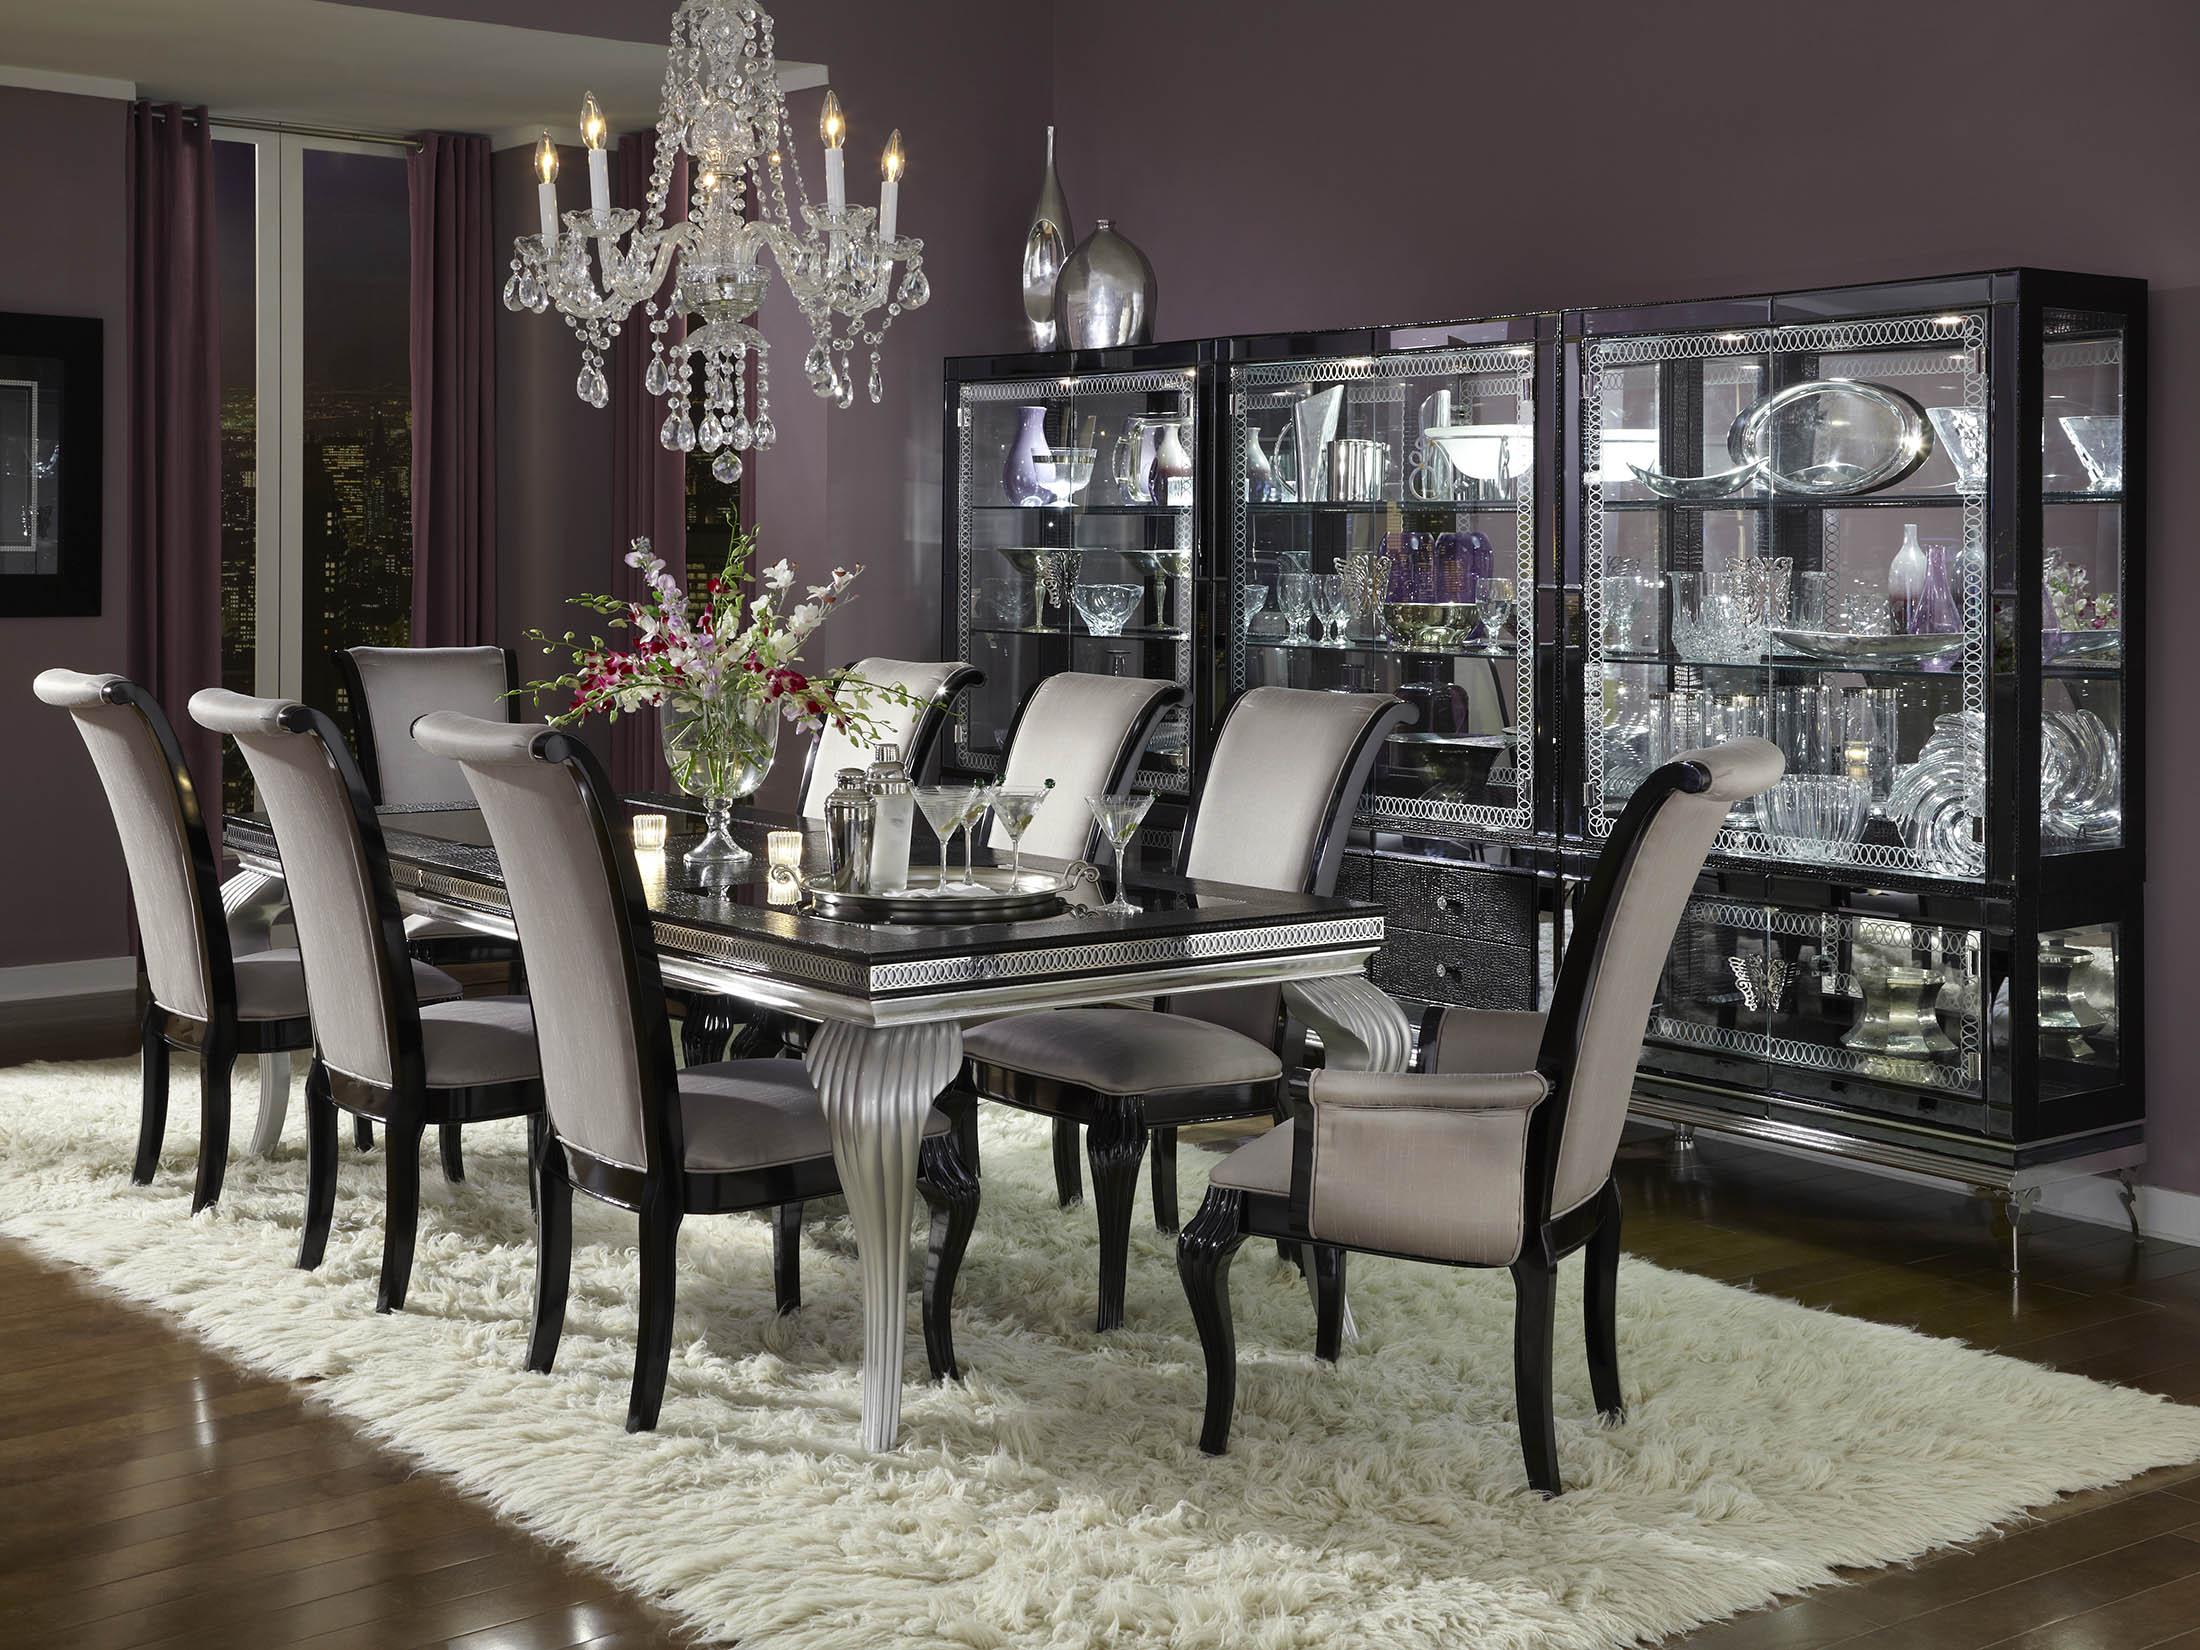 Superieur Furniture Savings.com